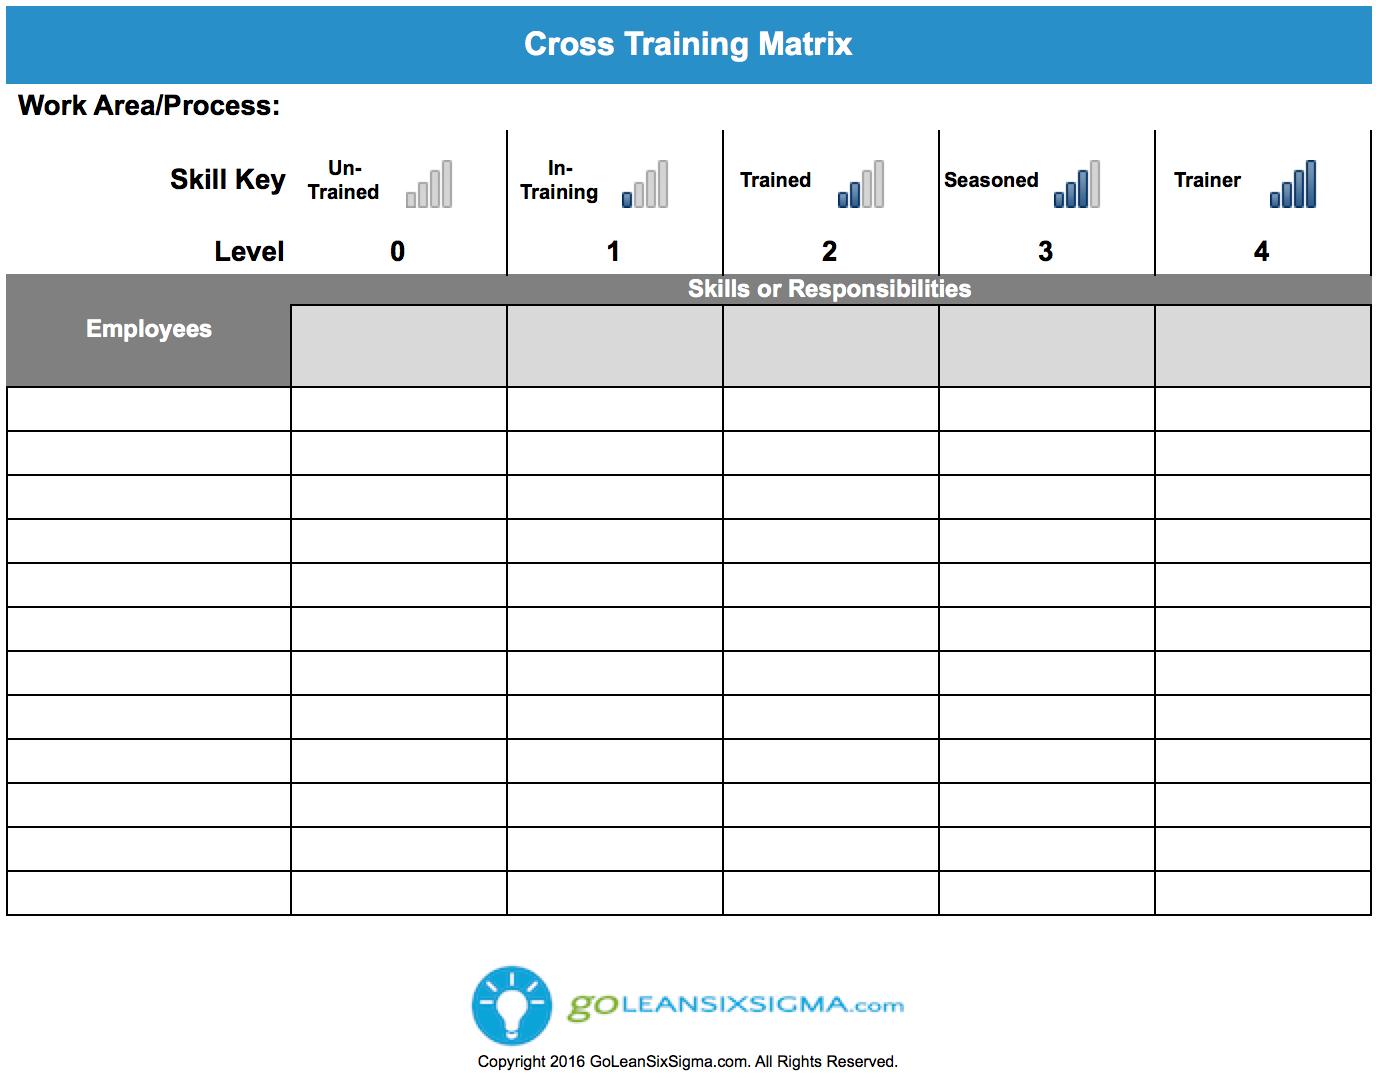 Cross Training Matrix